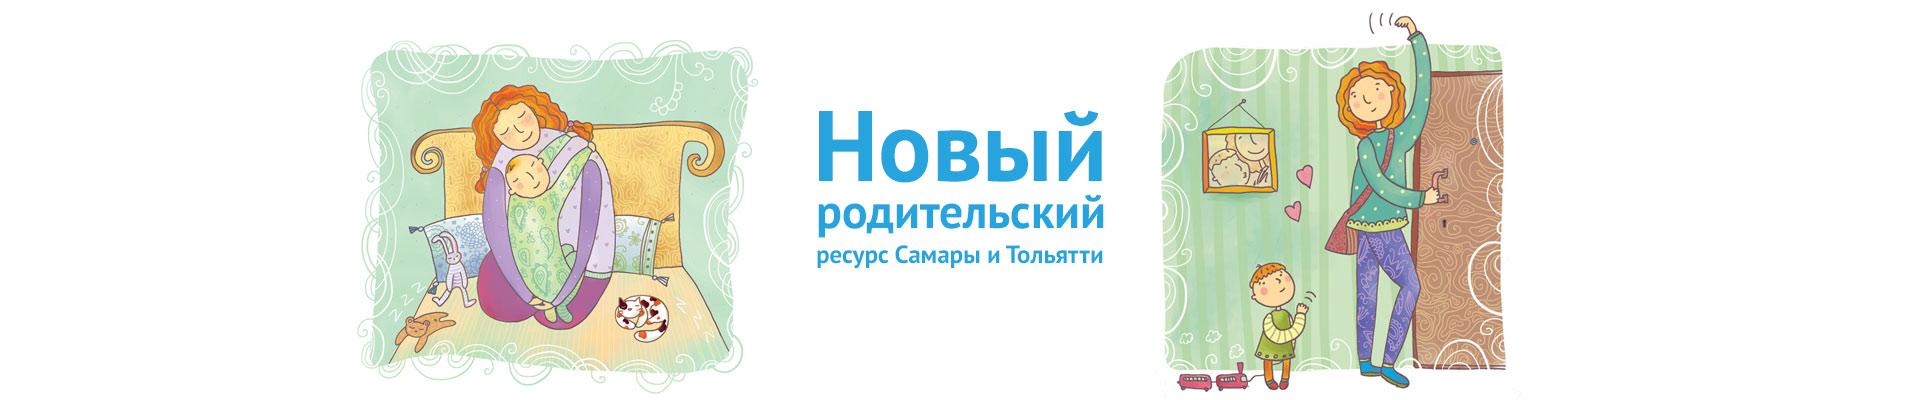 ishu-sado-mazo-partnera-samara-zrelaya-figuristaya-mohnatka-tetya-foto